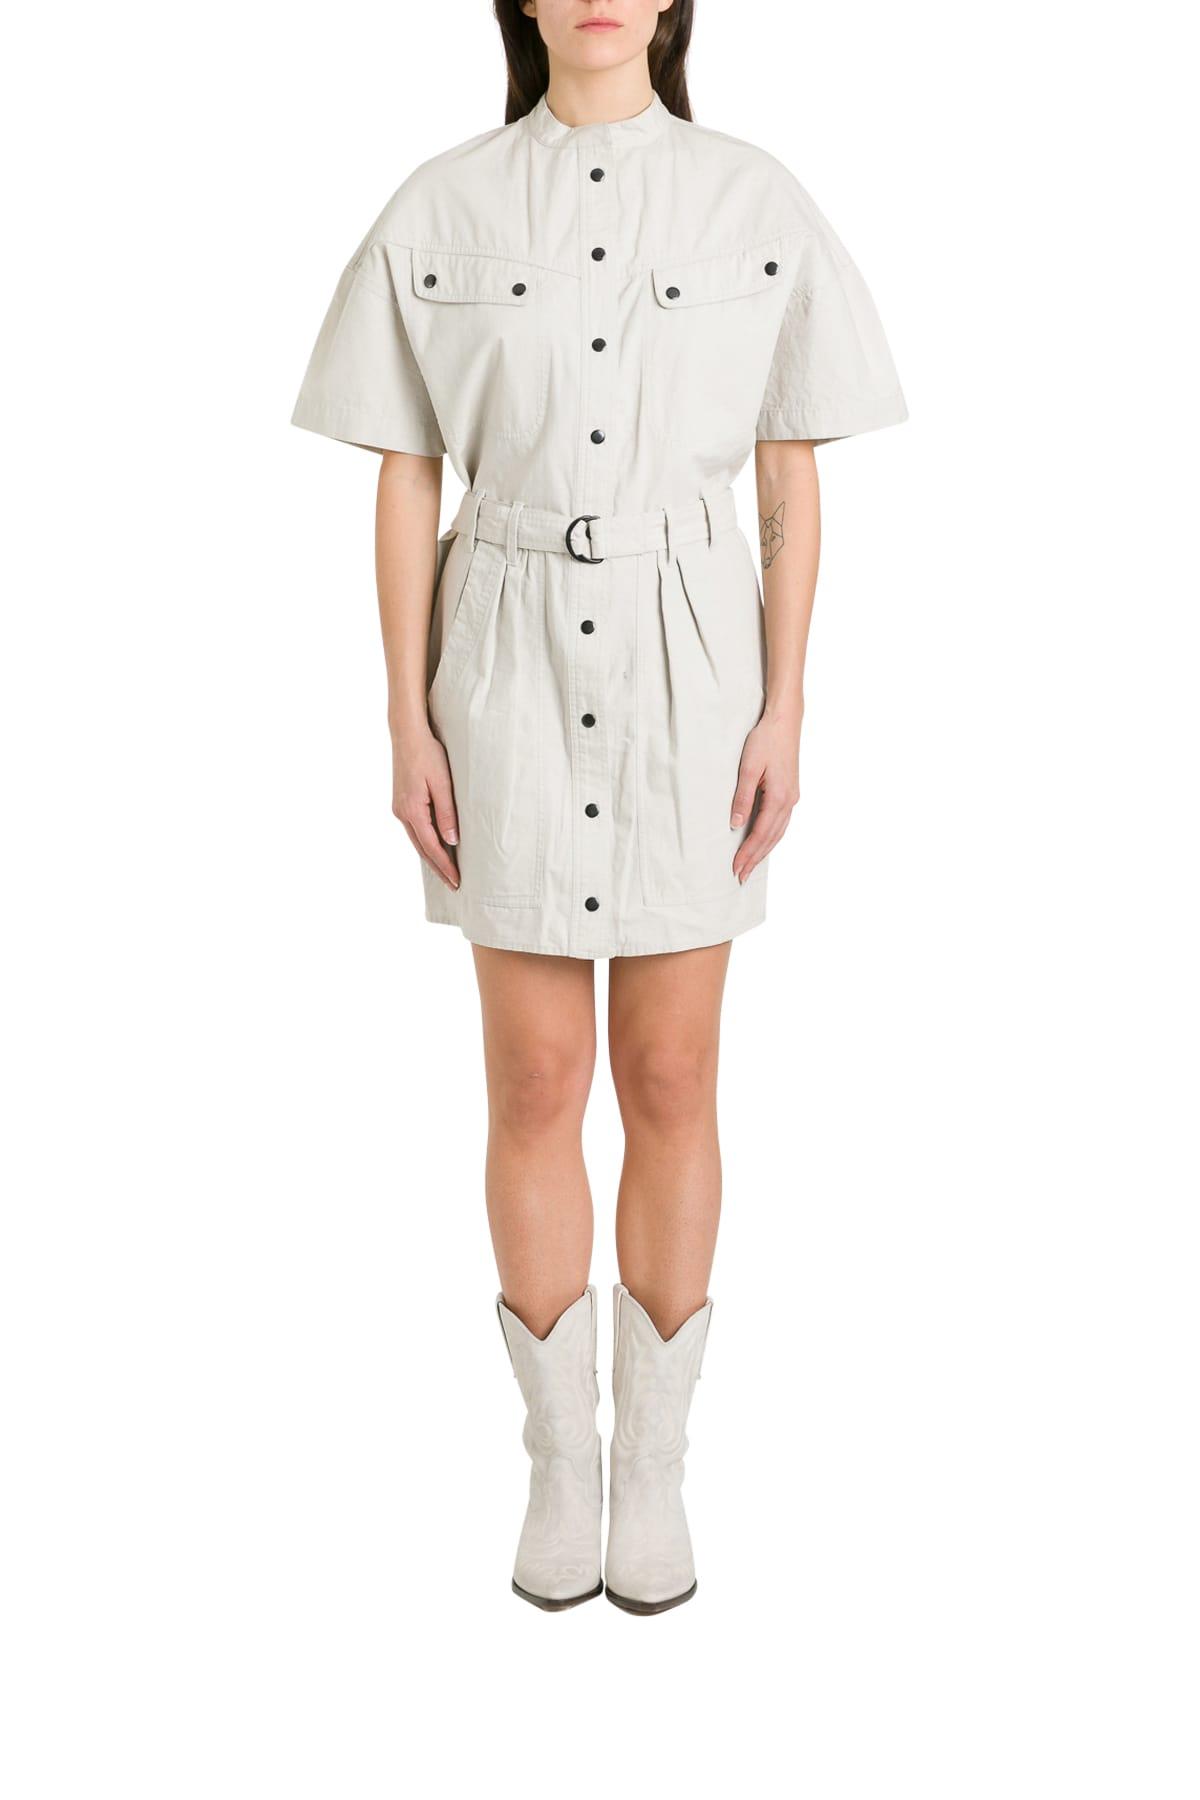 Buy Isabel Marant Étoile Zolina Pinafore Dress online, shop Isabel Marant Étoile with free shipping